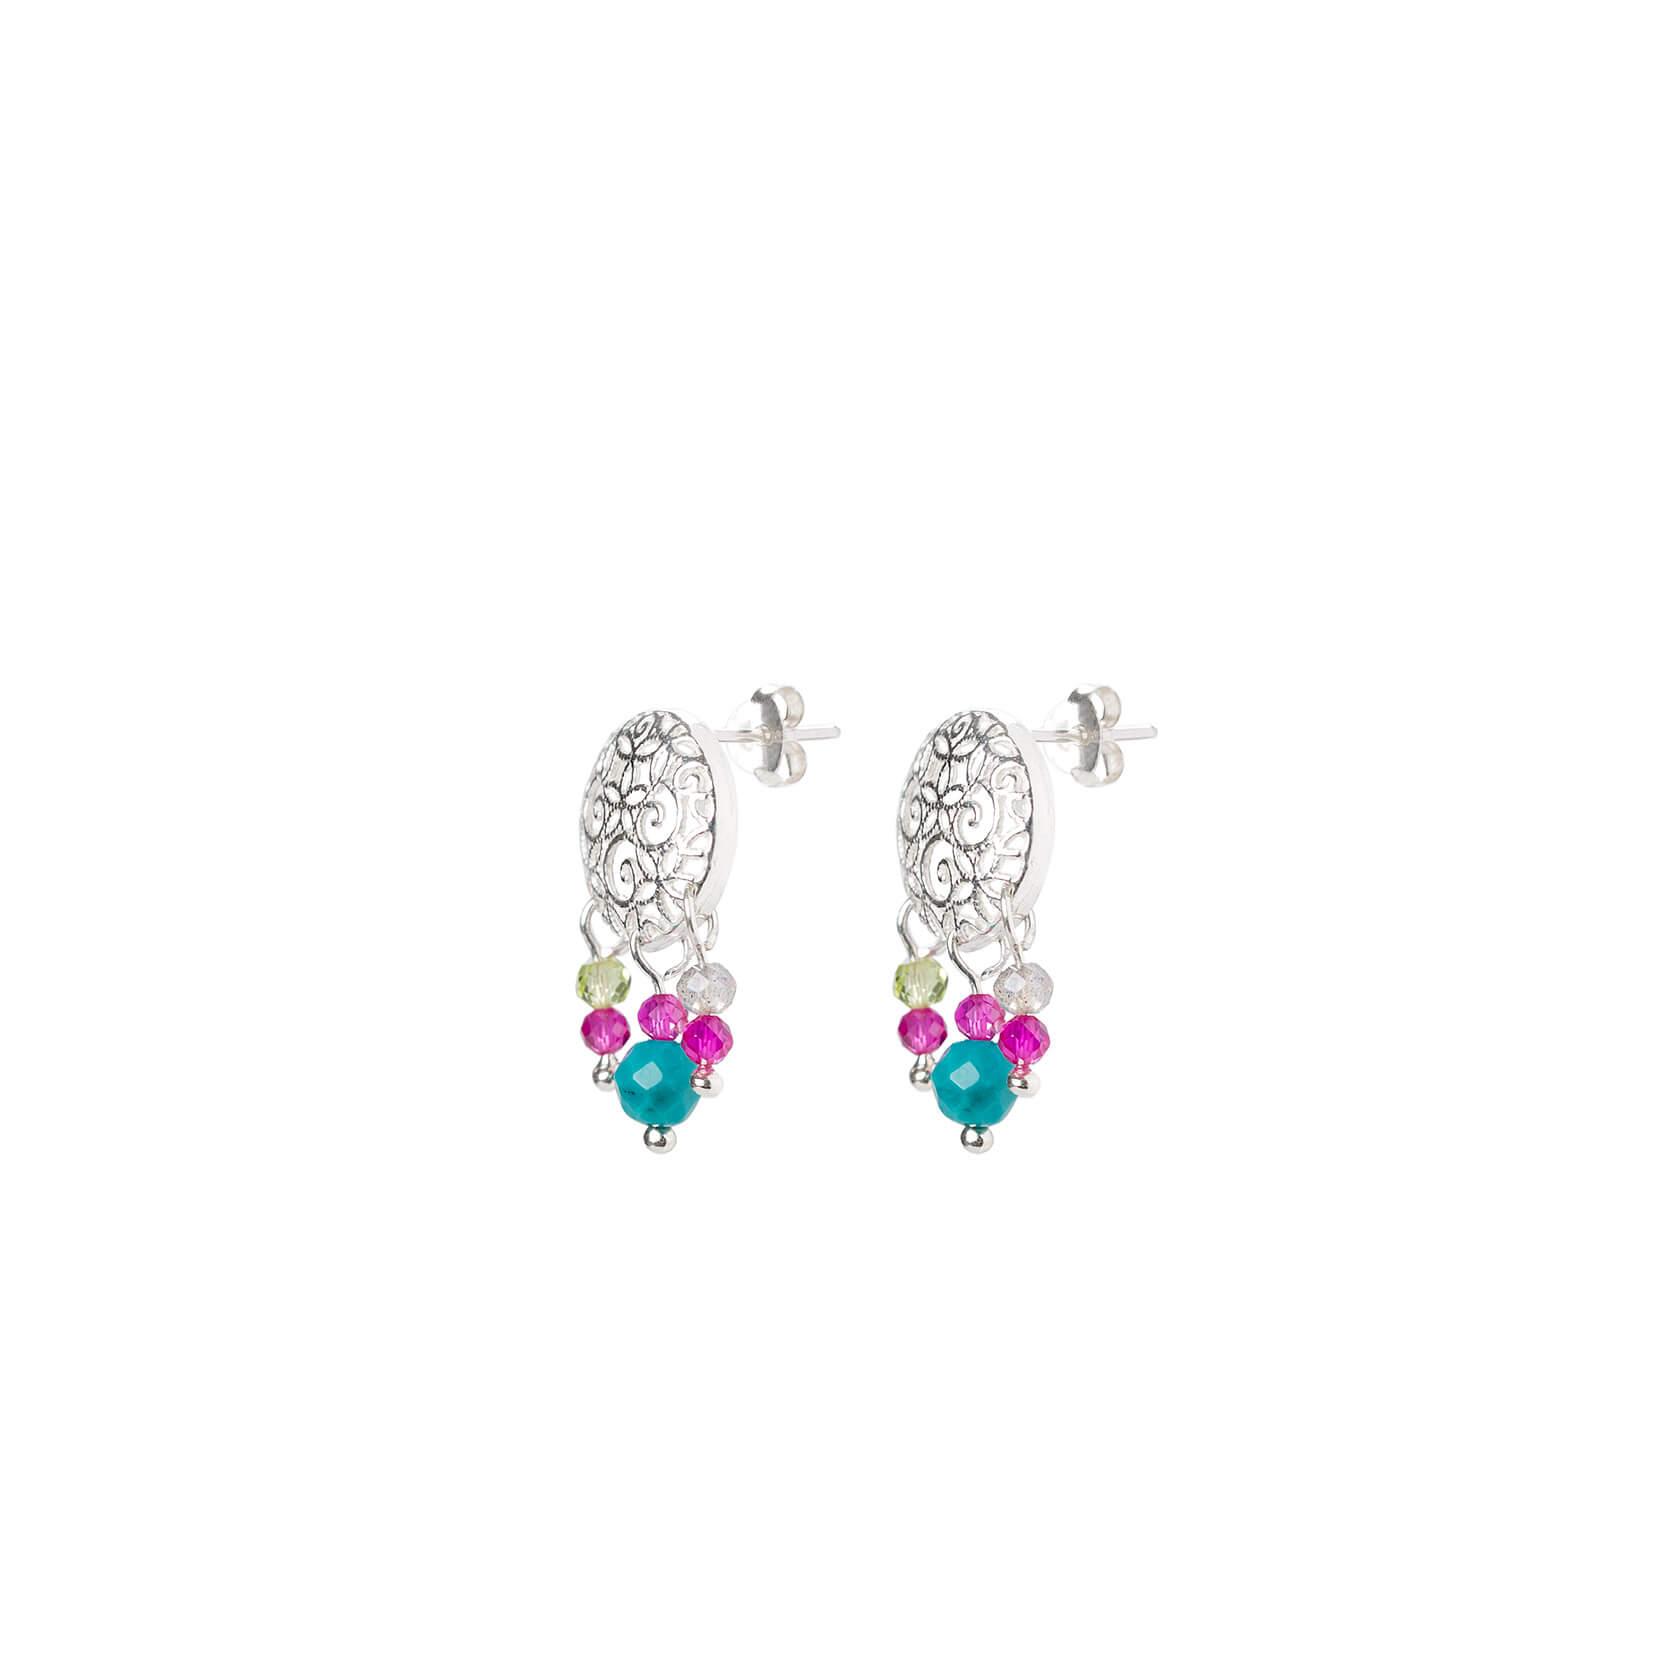 Turquoise and silver mandala earrings